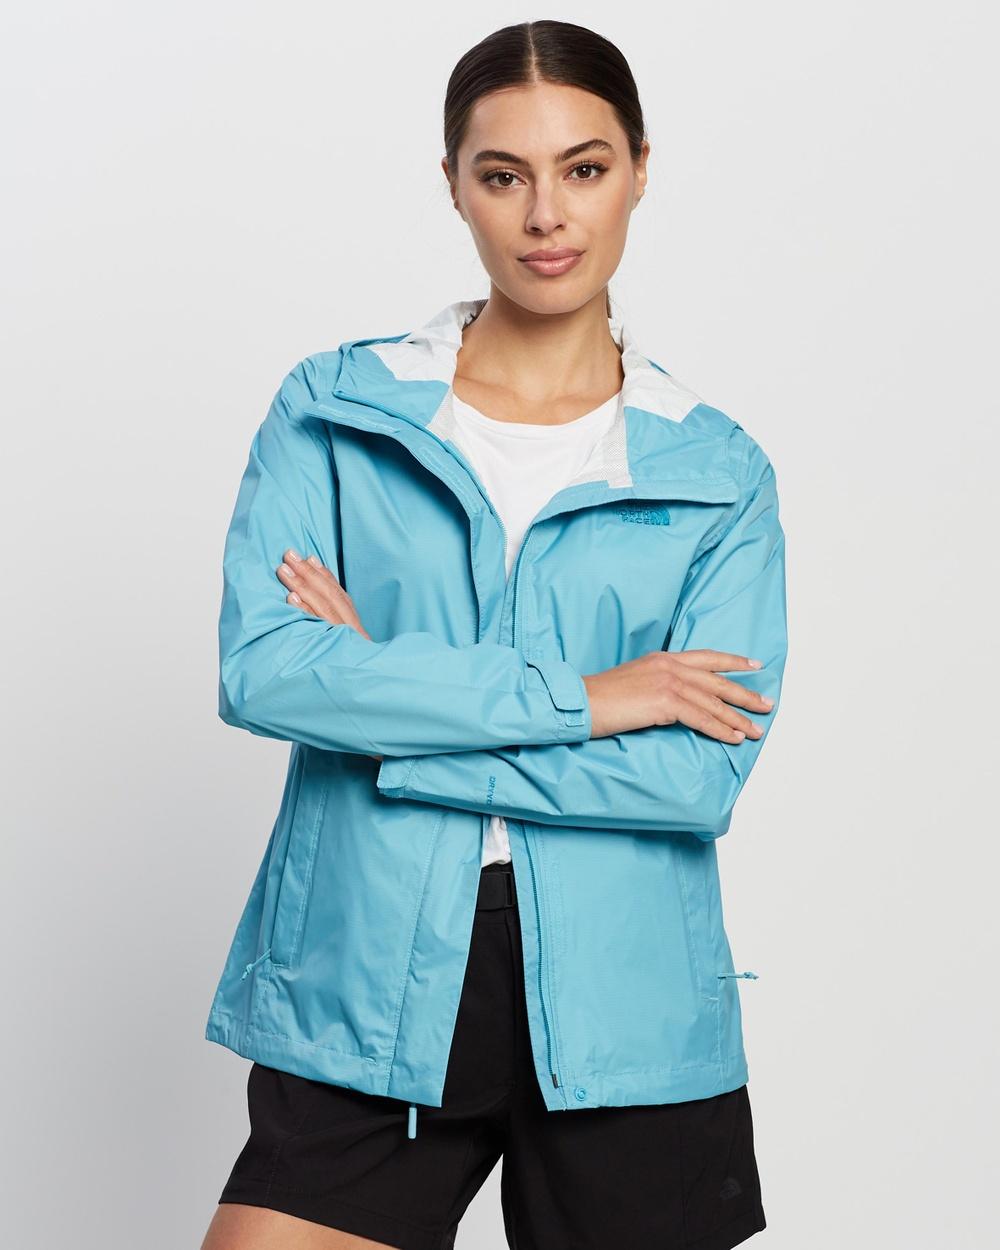 The North Face Venture 2 Jacket Coats & Jackets Maui Blue